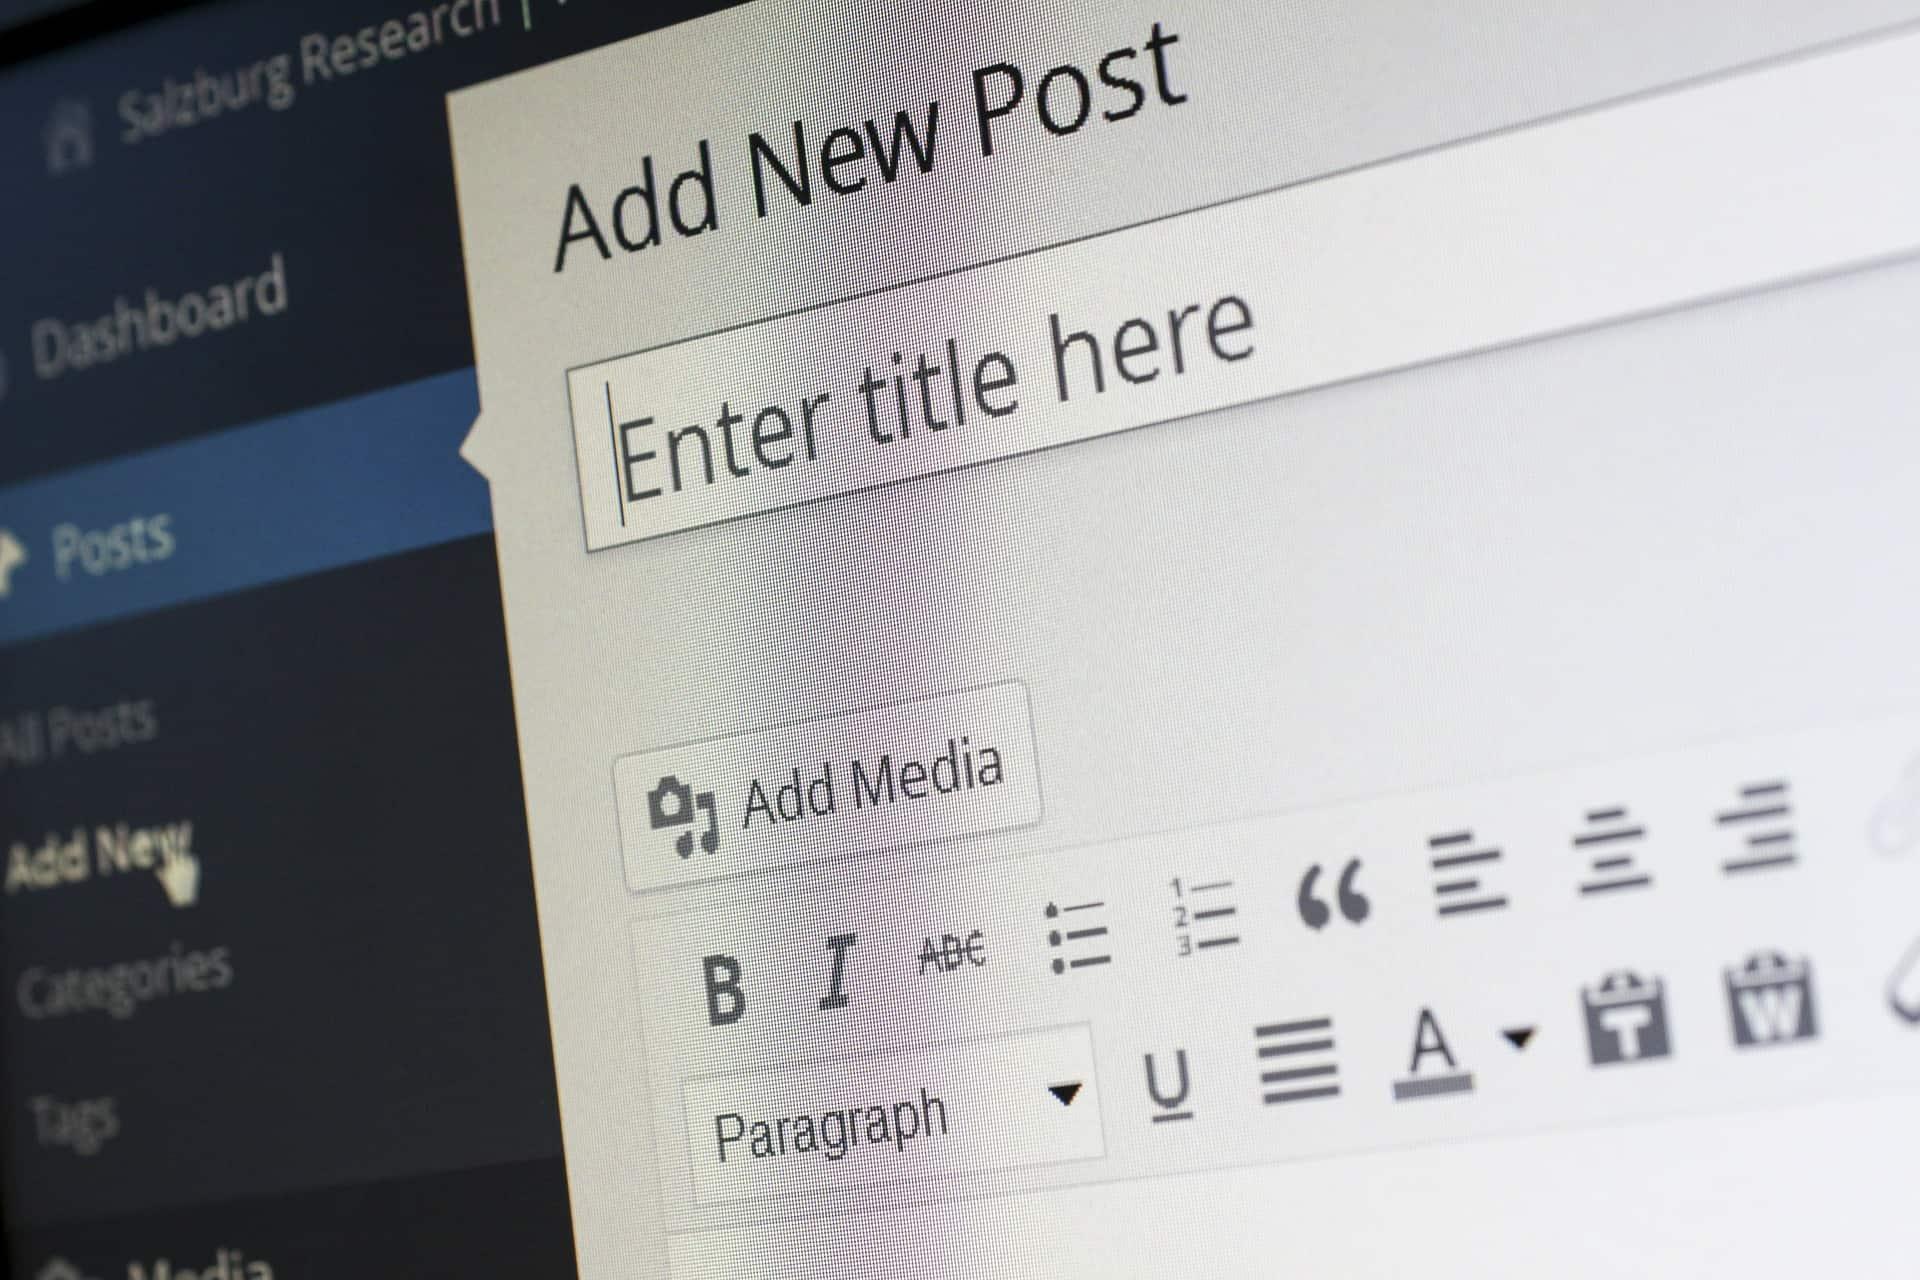 WordPress screen to create new post